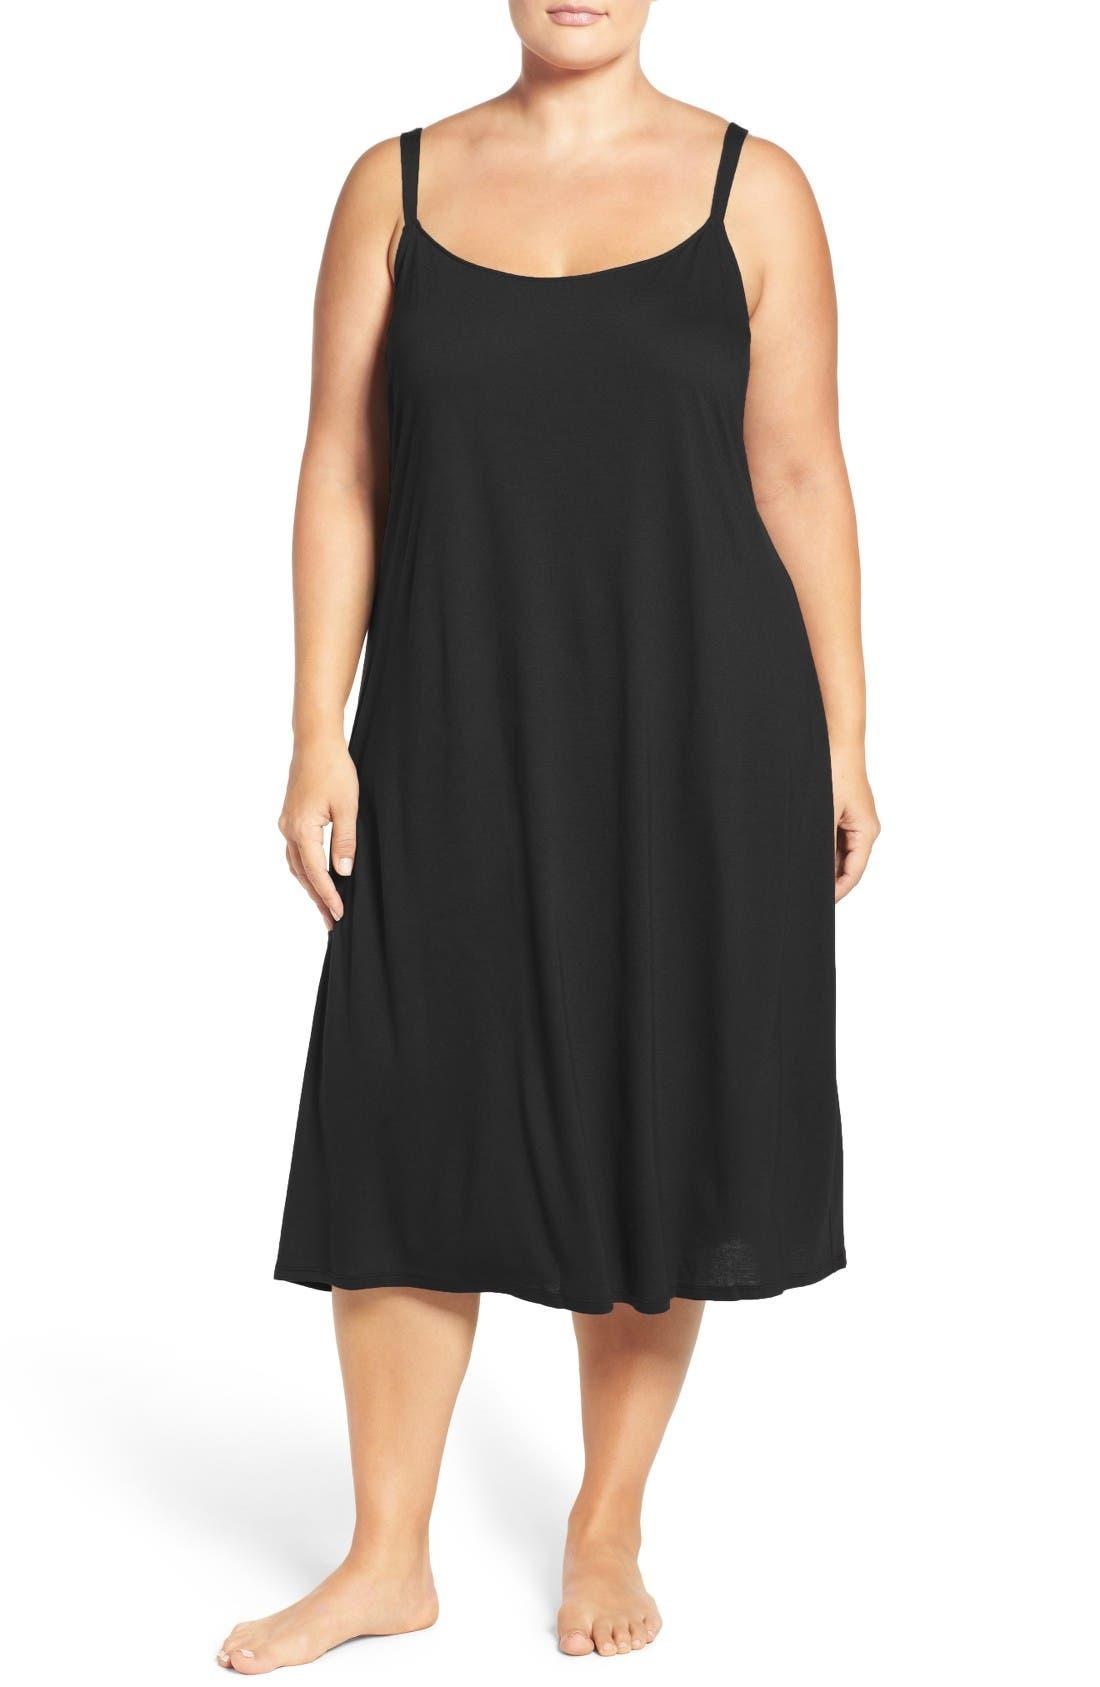 Main Image - Natori 'Shangri La' Nightgown (Plus Size)